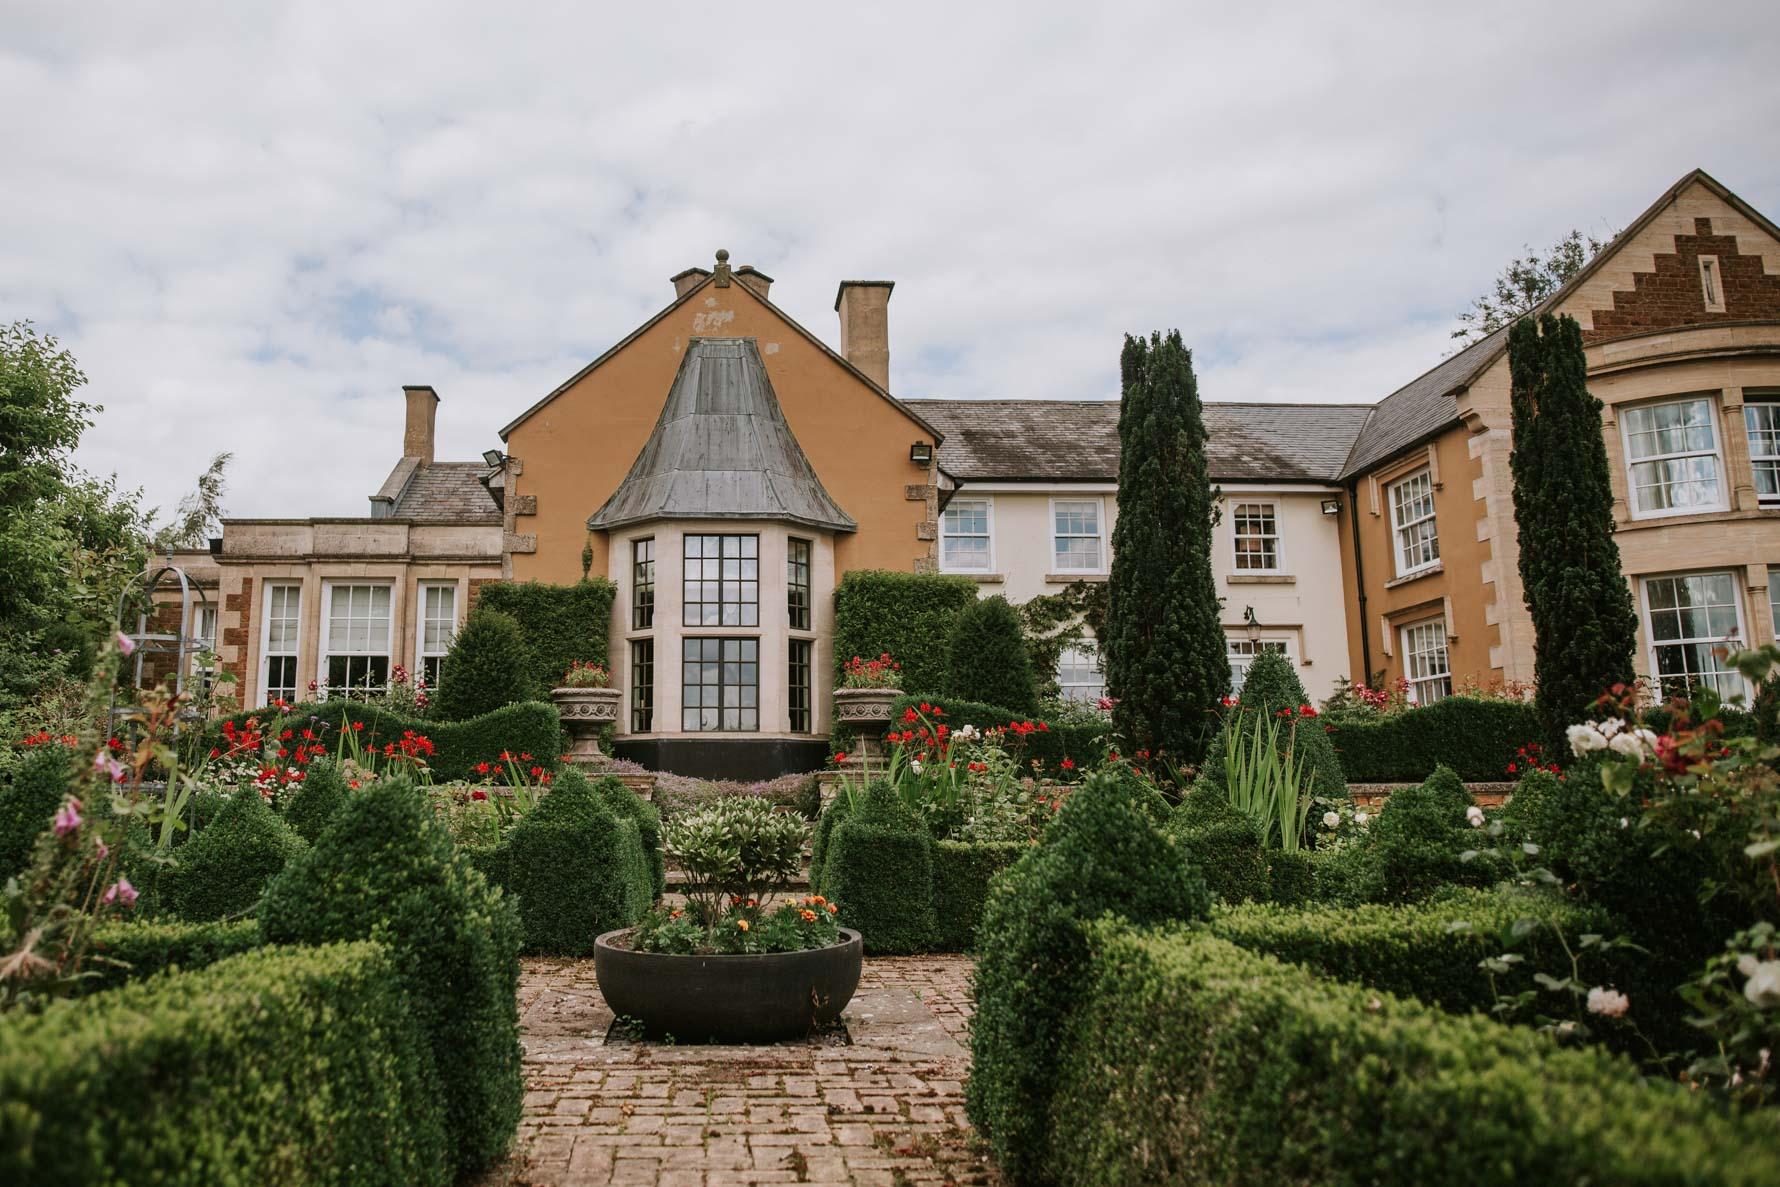 View of Ladywood estate wedding venue gardens